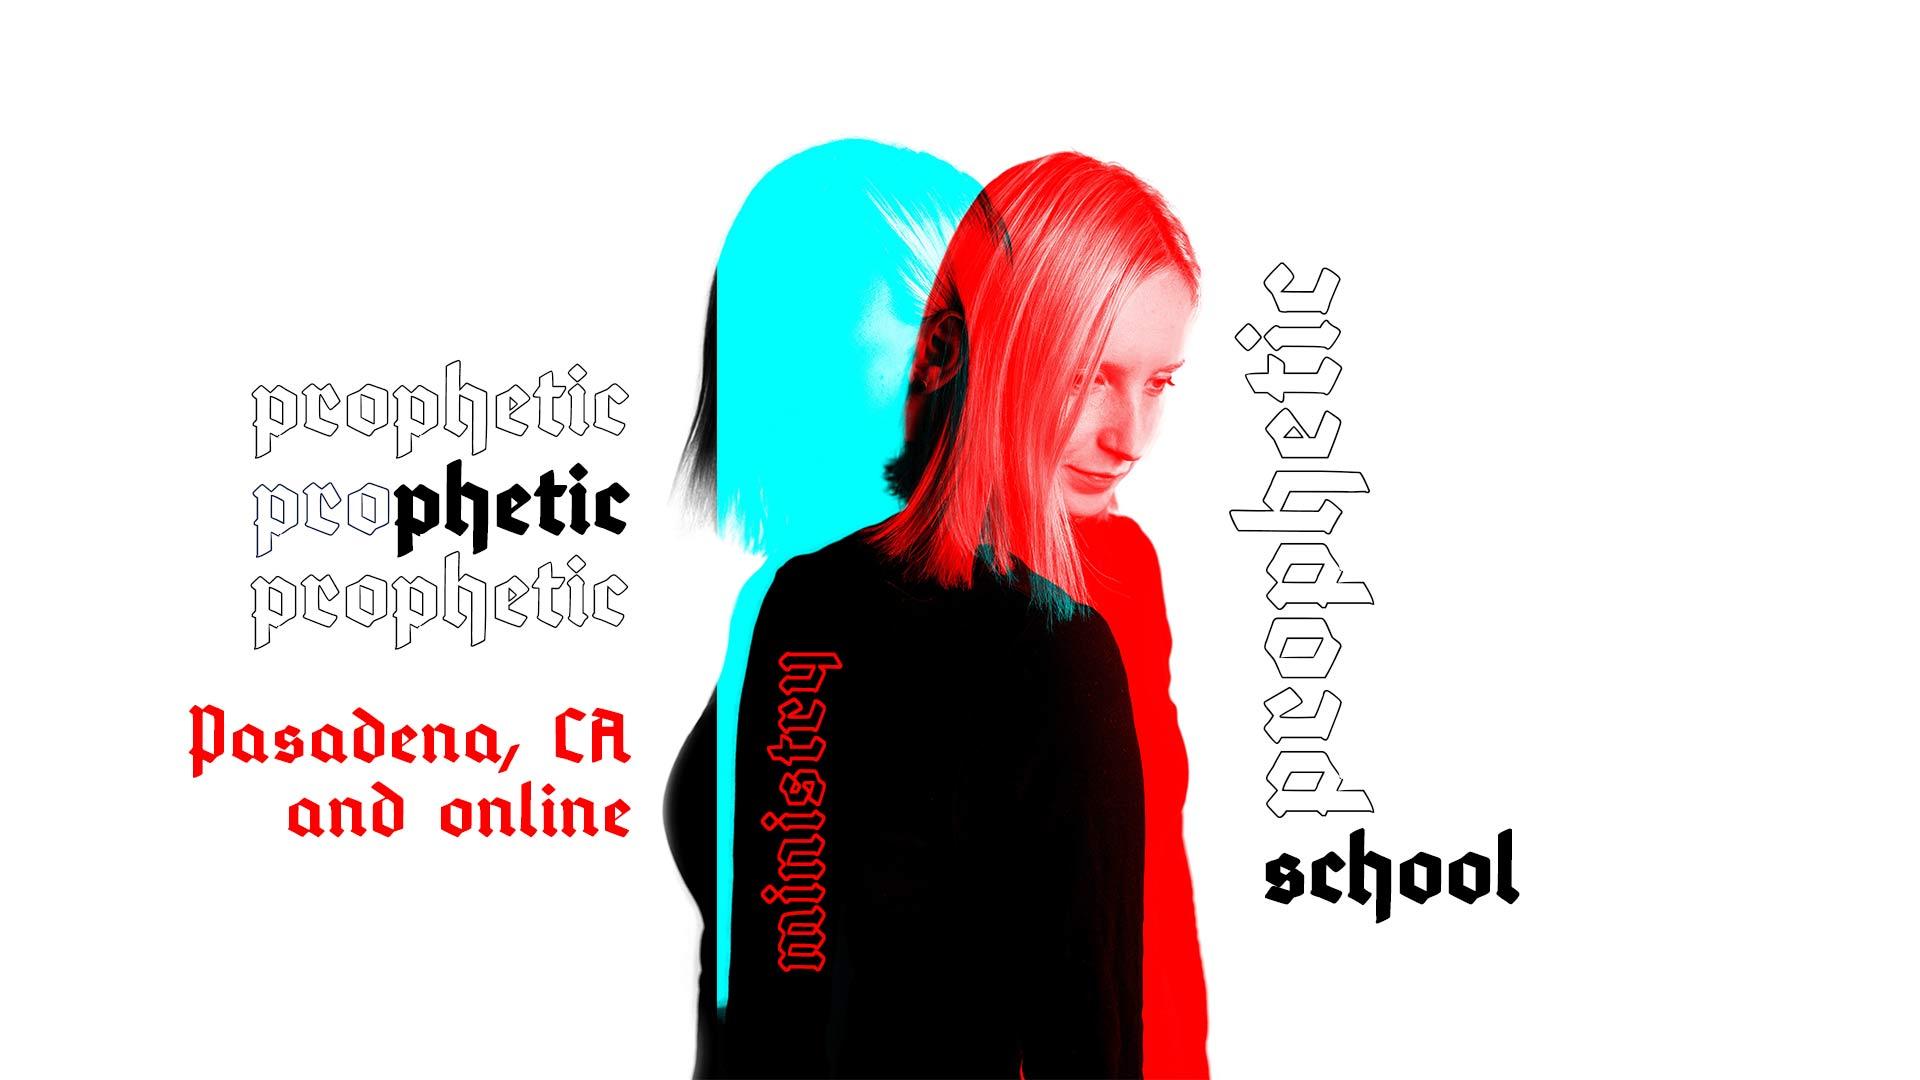 prophetic-school-with-location.jpg